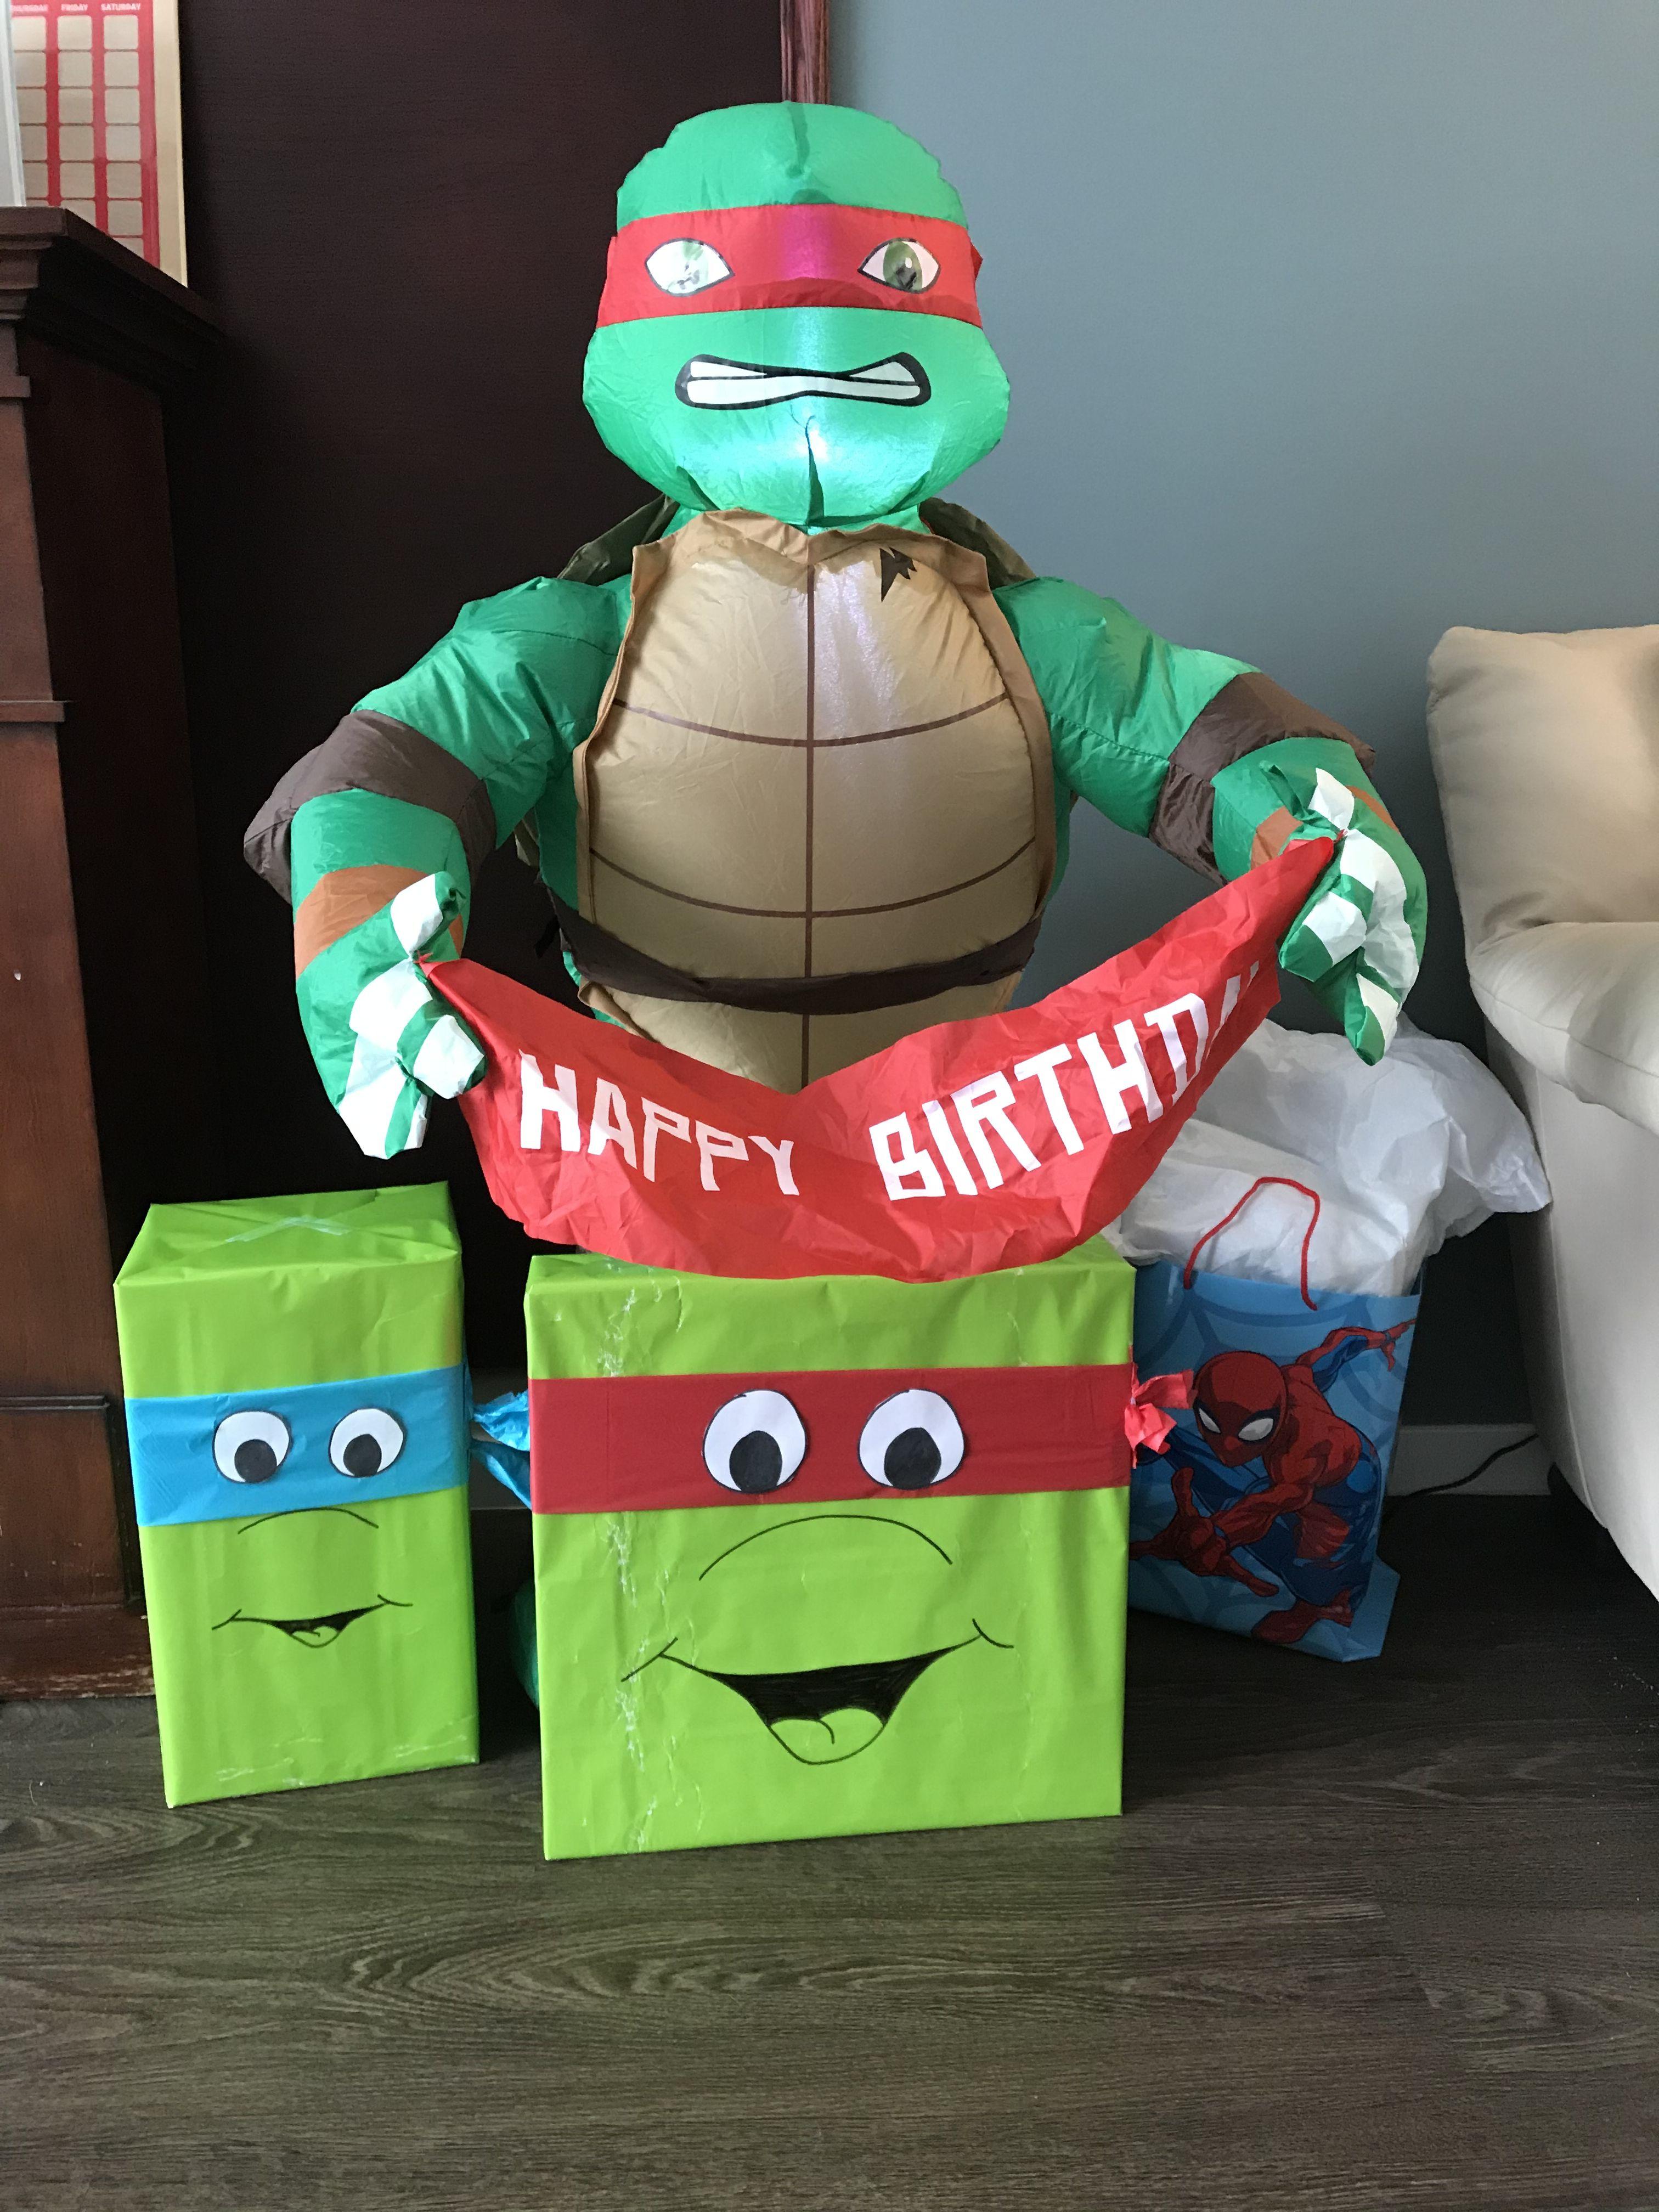 Ninja Turtle Theme Birthday In 2020 Turtle Theme Ninja Turtle Theme Ninja Turtle Party